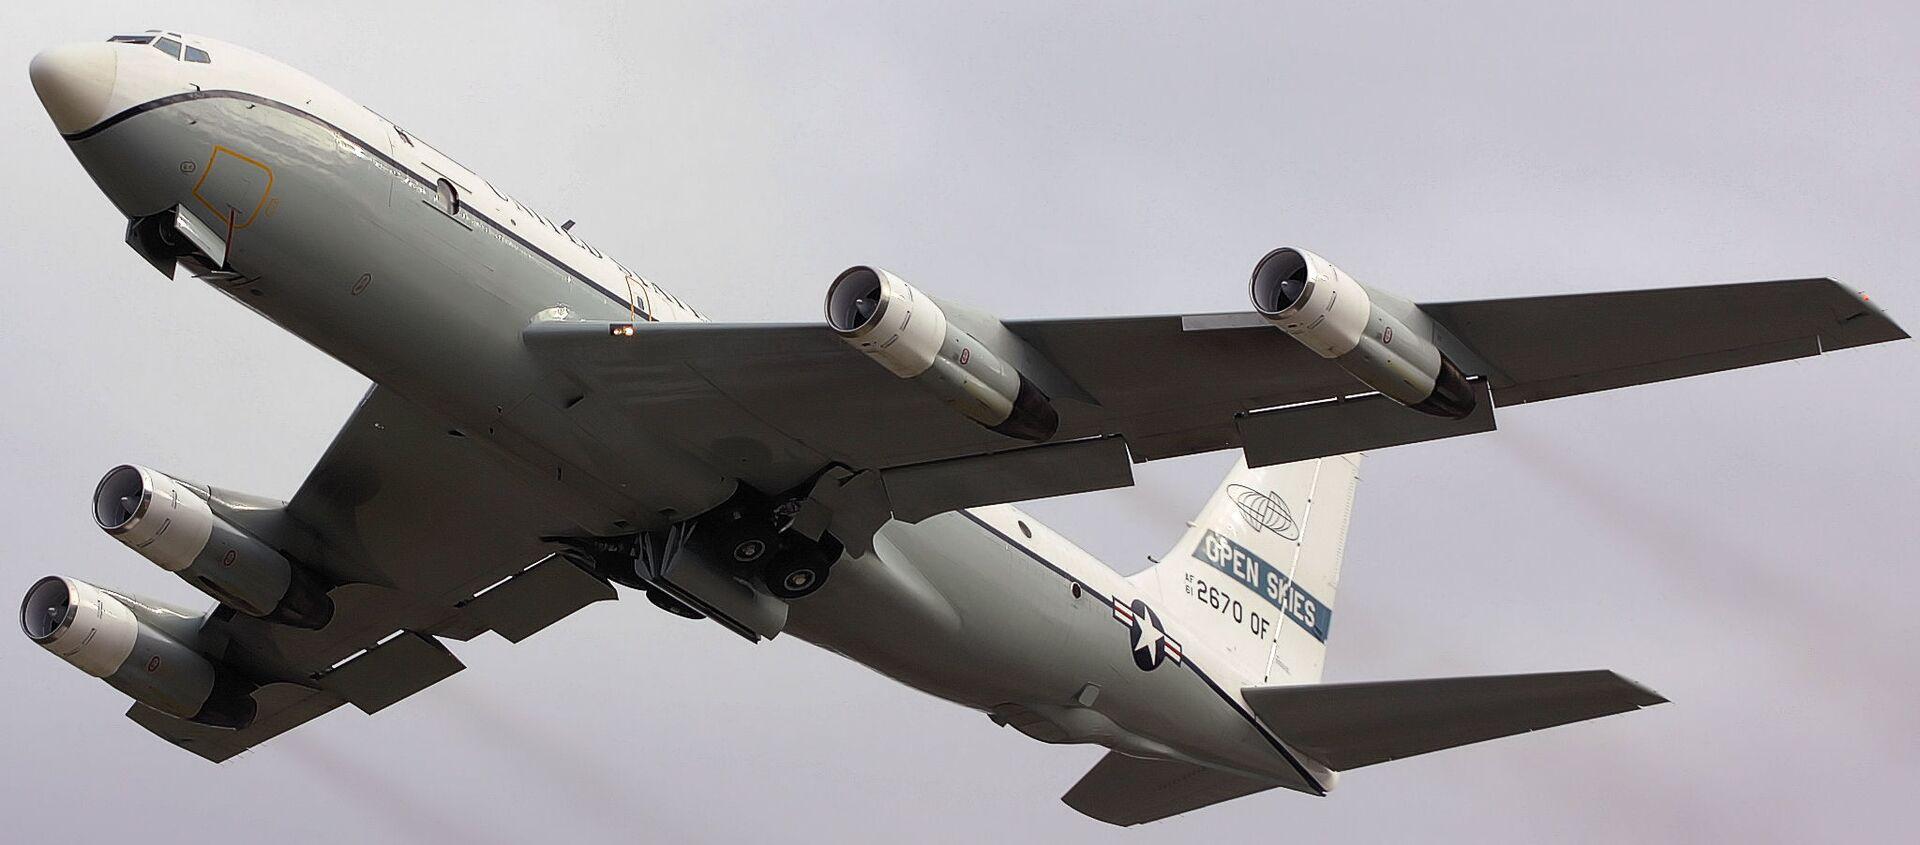 Американский самолет наблюдения OC-135B Open Skies - Sputnik Polska, 1920, 19.03.2021